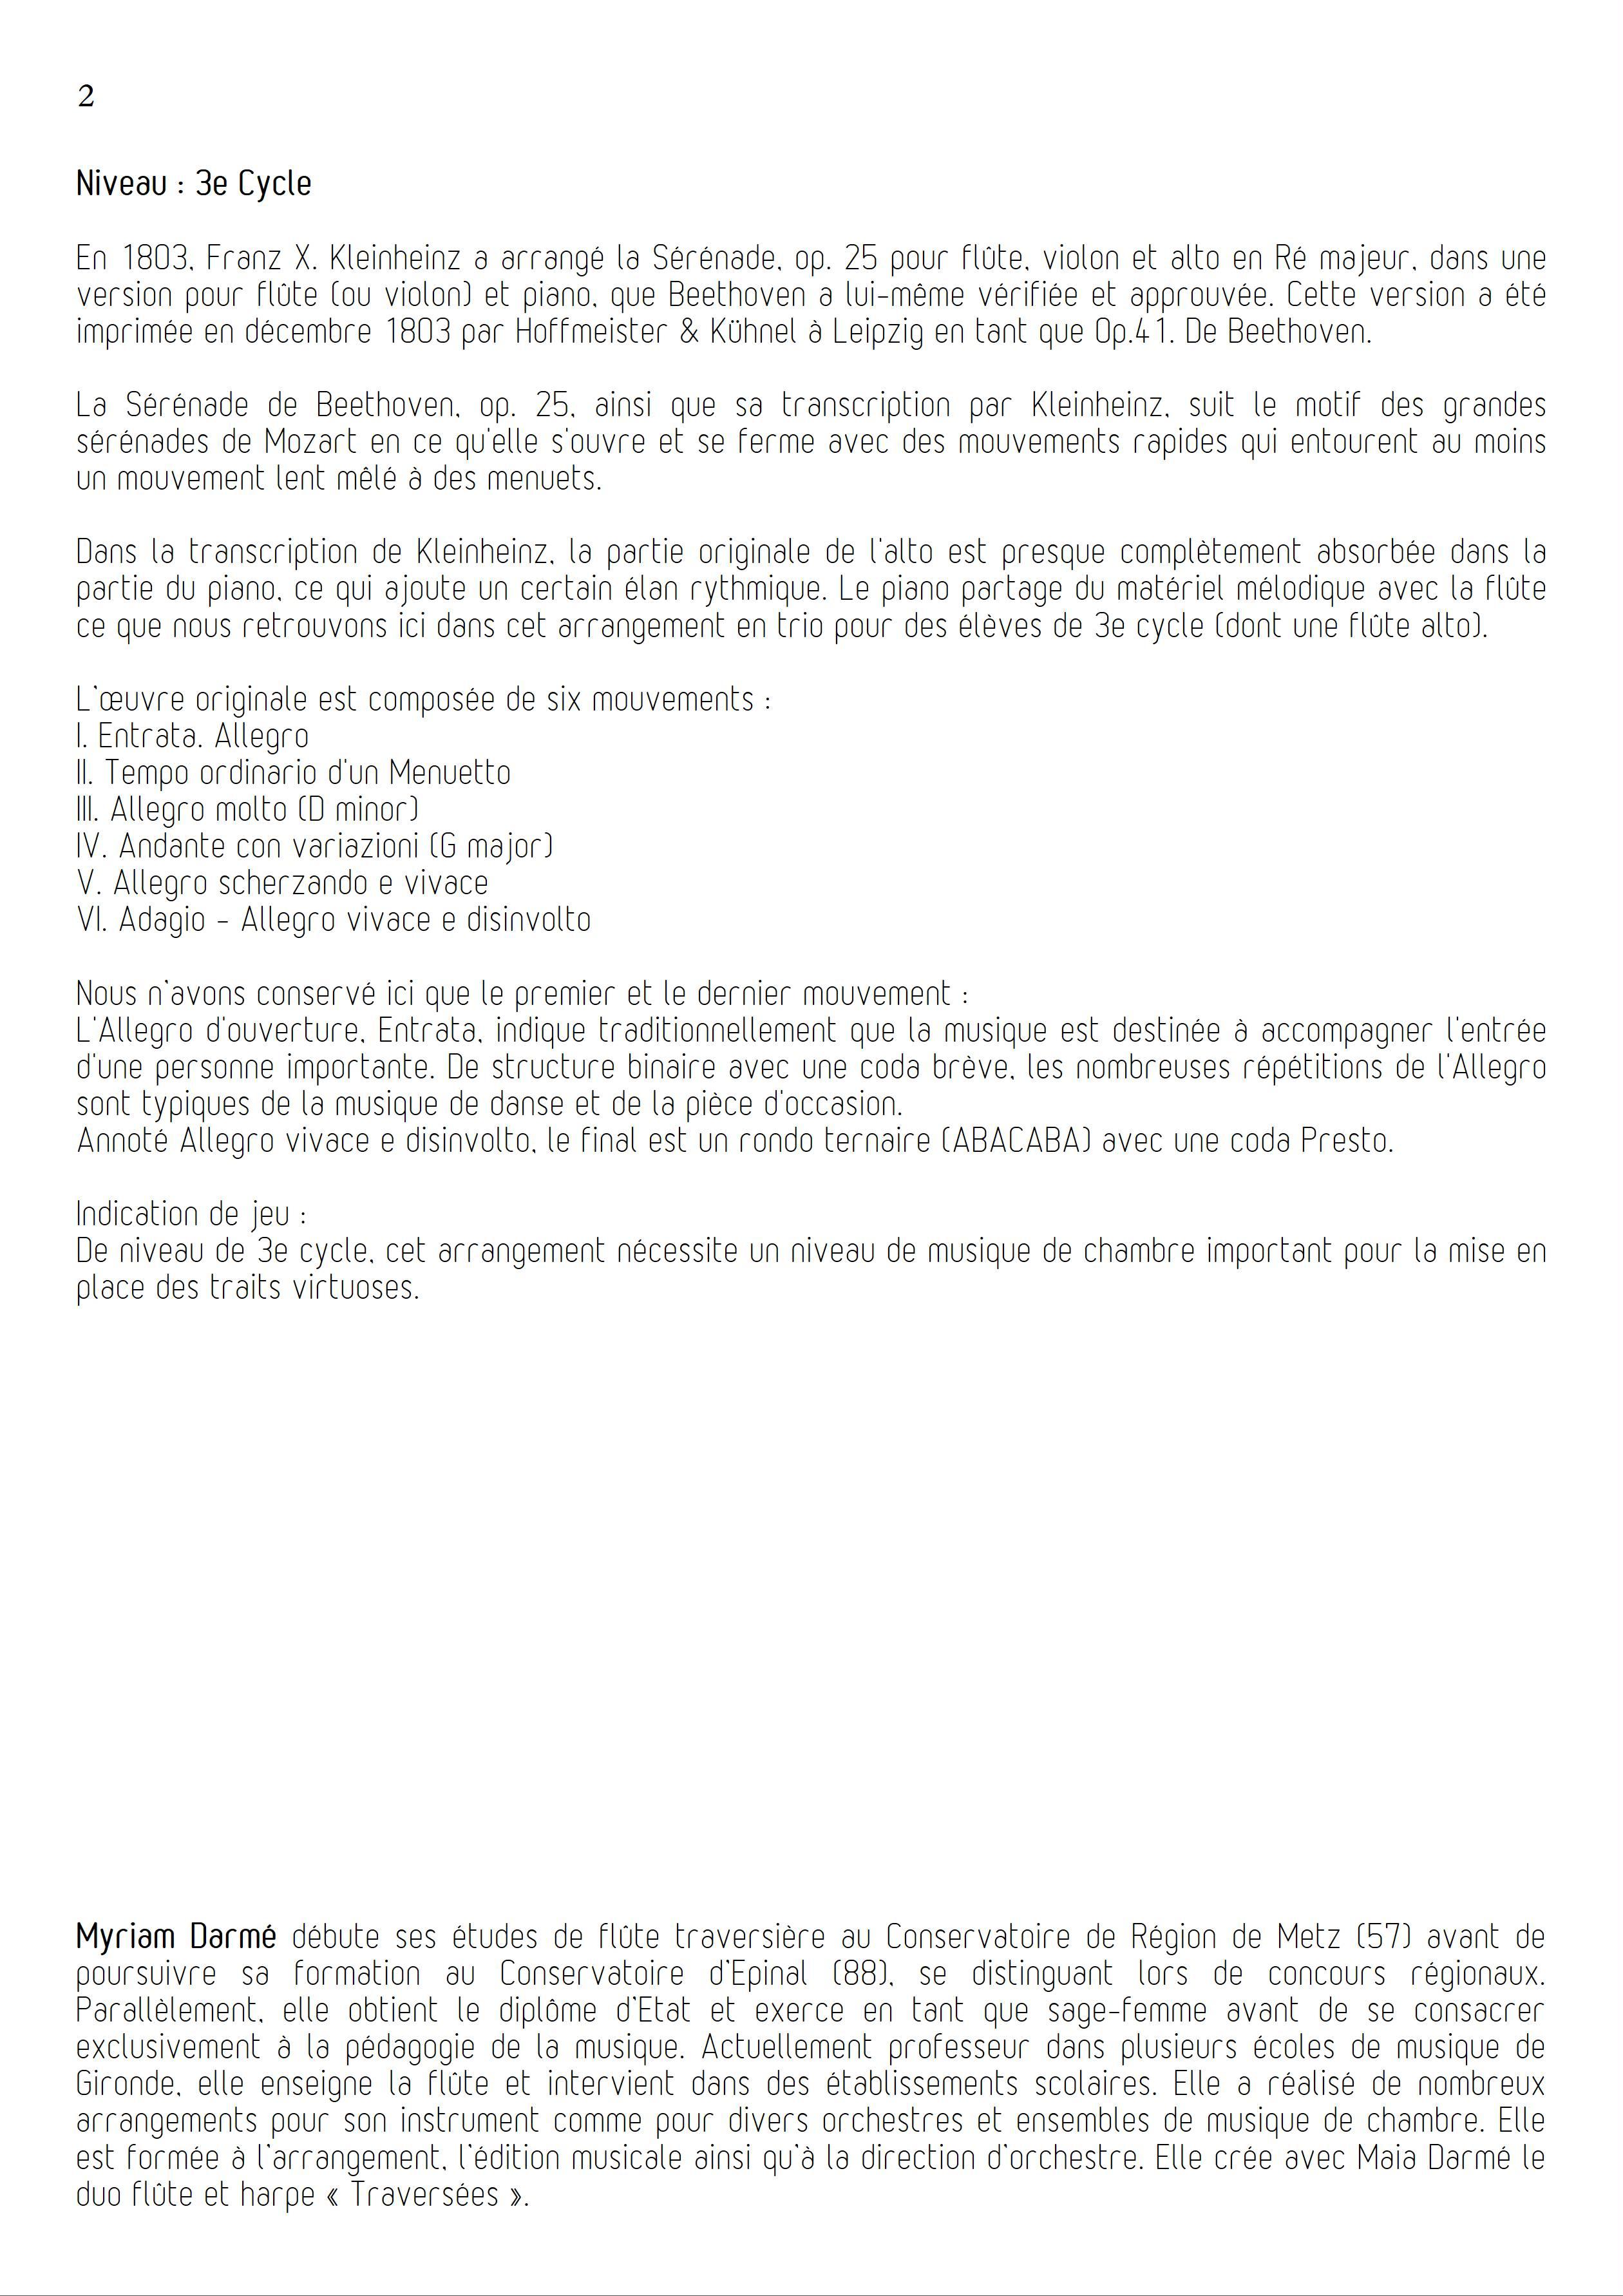 Serenade Op 25 - Trio de Flûtes - BEETHOVEN L. V. - Educationnal sheet